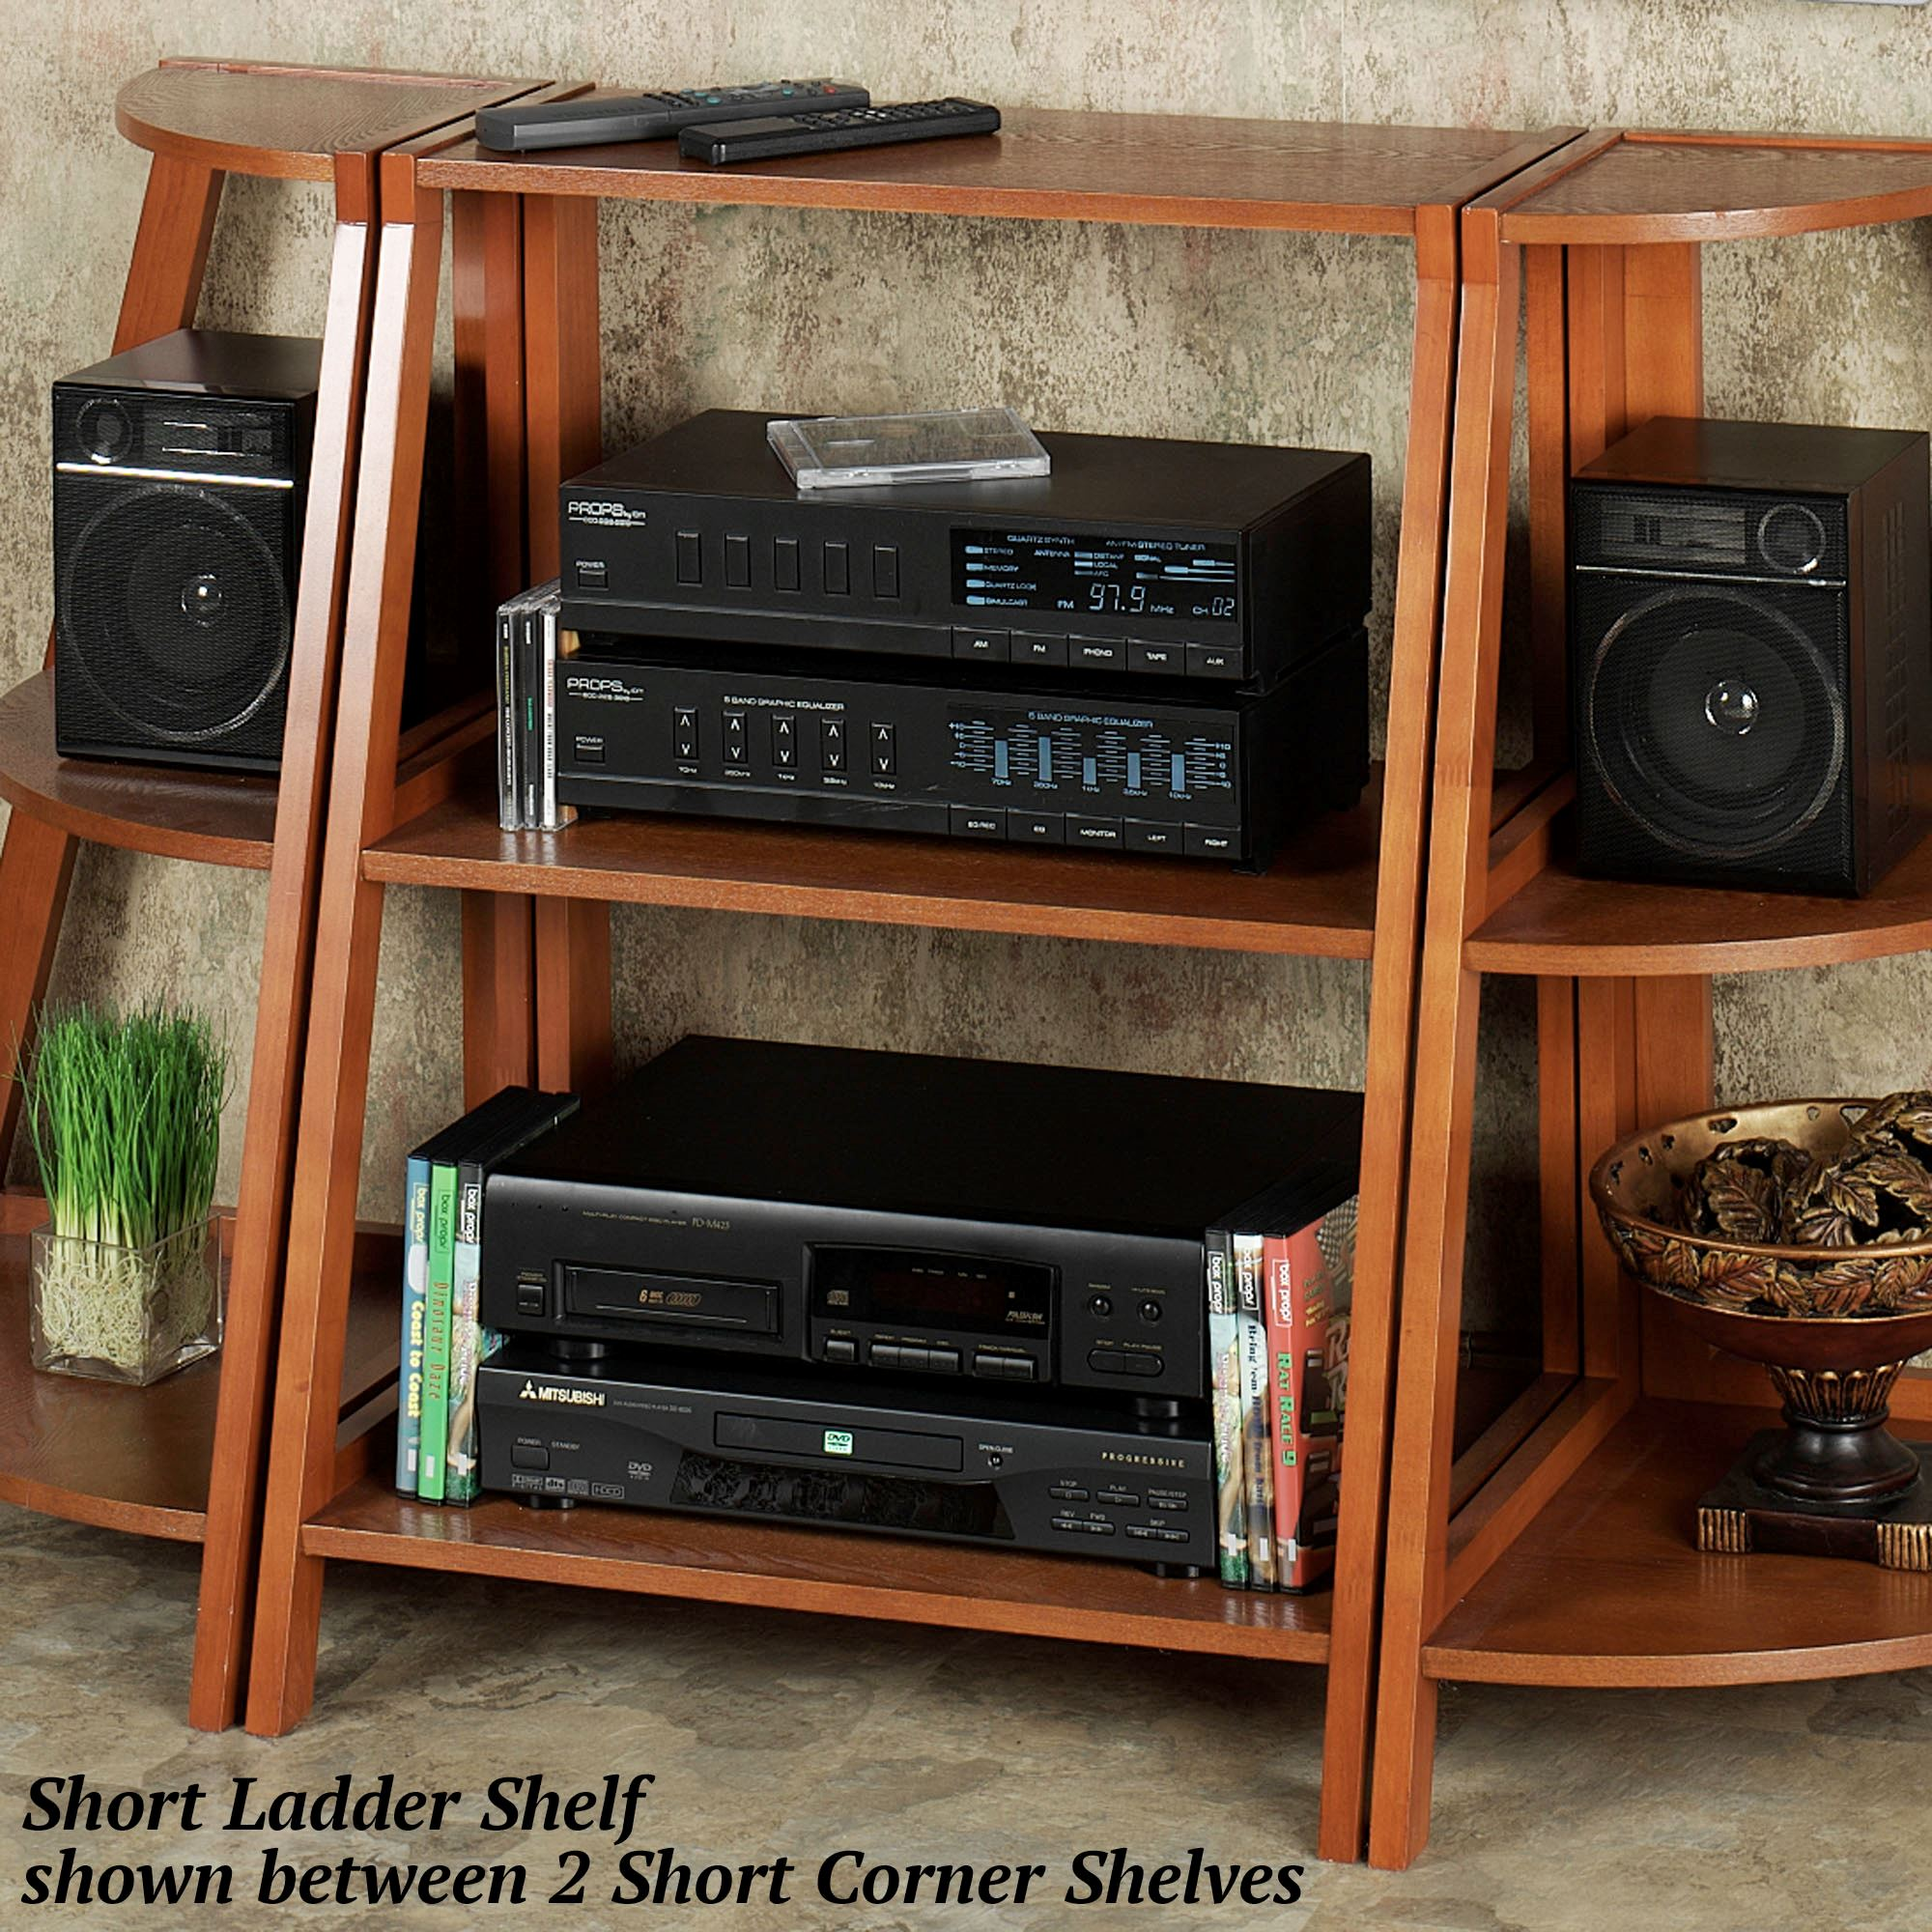 Kimber Short Ladder Shelf Only Mission Red Oak Three Tier